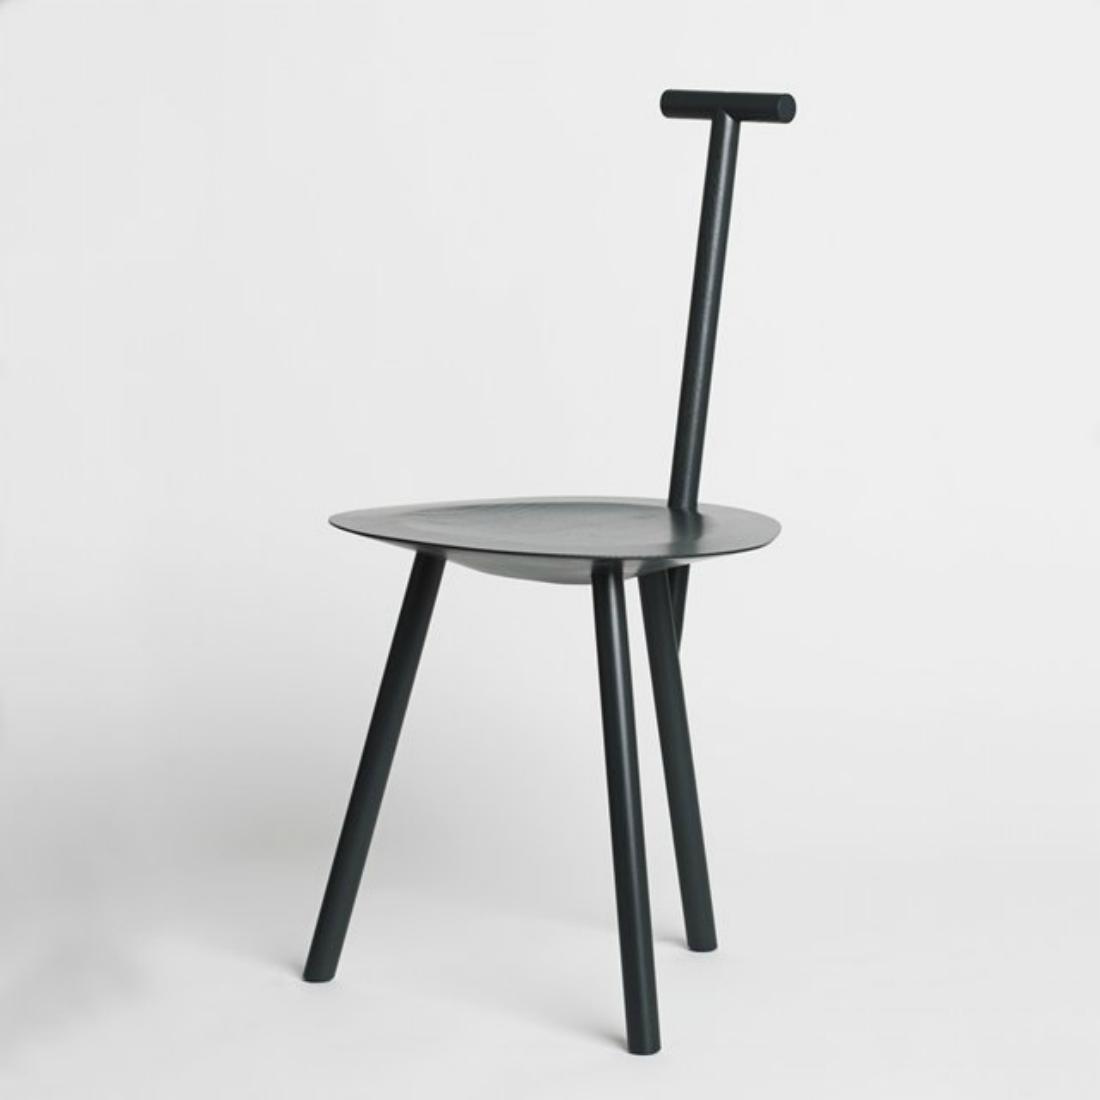 Batch Spade Chair. Faye Toogood